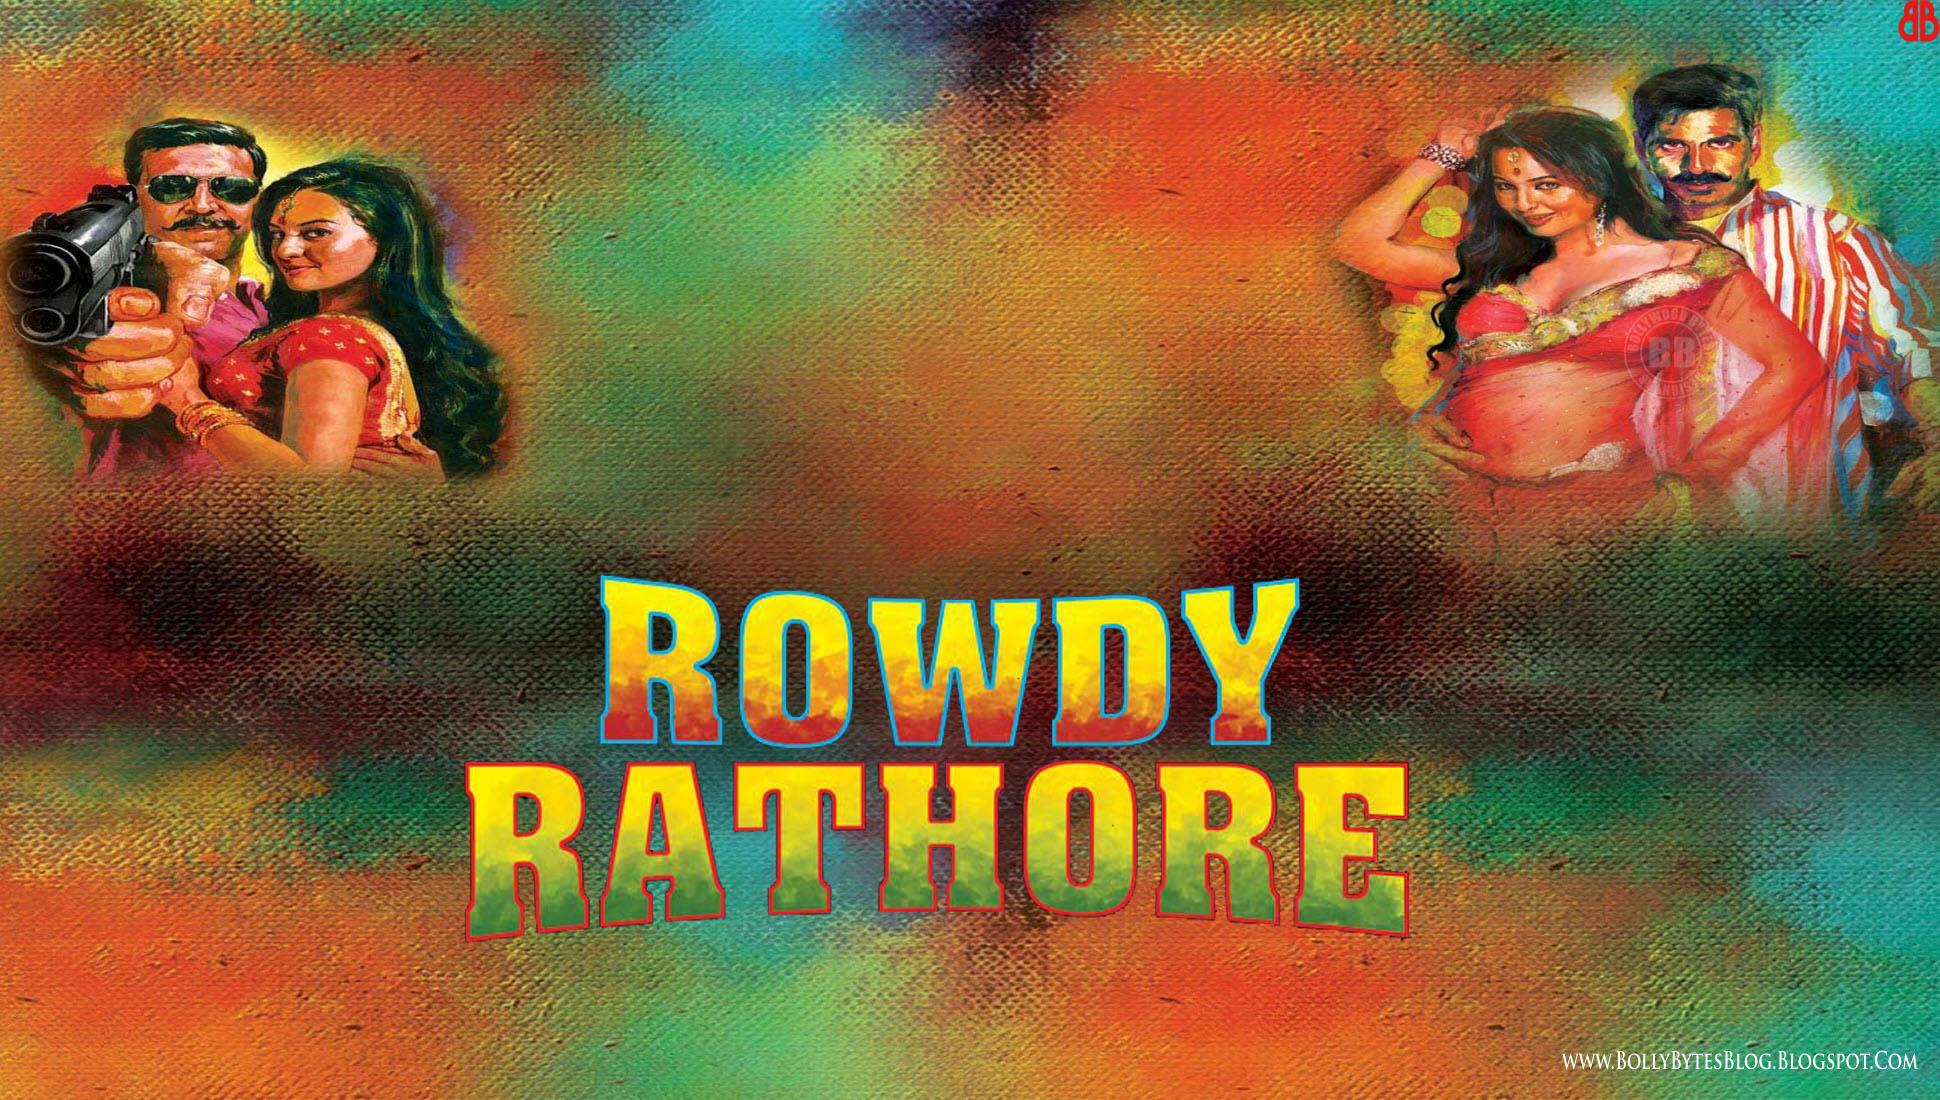 http://3.bp.blogspot.com/--8dFv-6uBnU/T5iax6hLNxI/AAAAAAAAG_M/f4BsXb6Ln5k/s1940/Rowdy-Rathore-Akshay-Kumar-Hot-Sonakshi-Sinha-HQ-Wallpapers-06.jpg